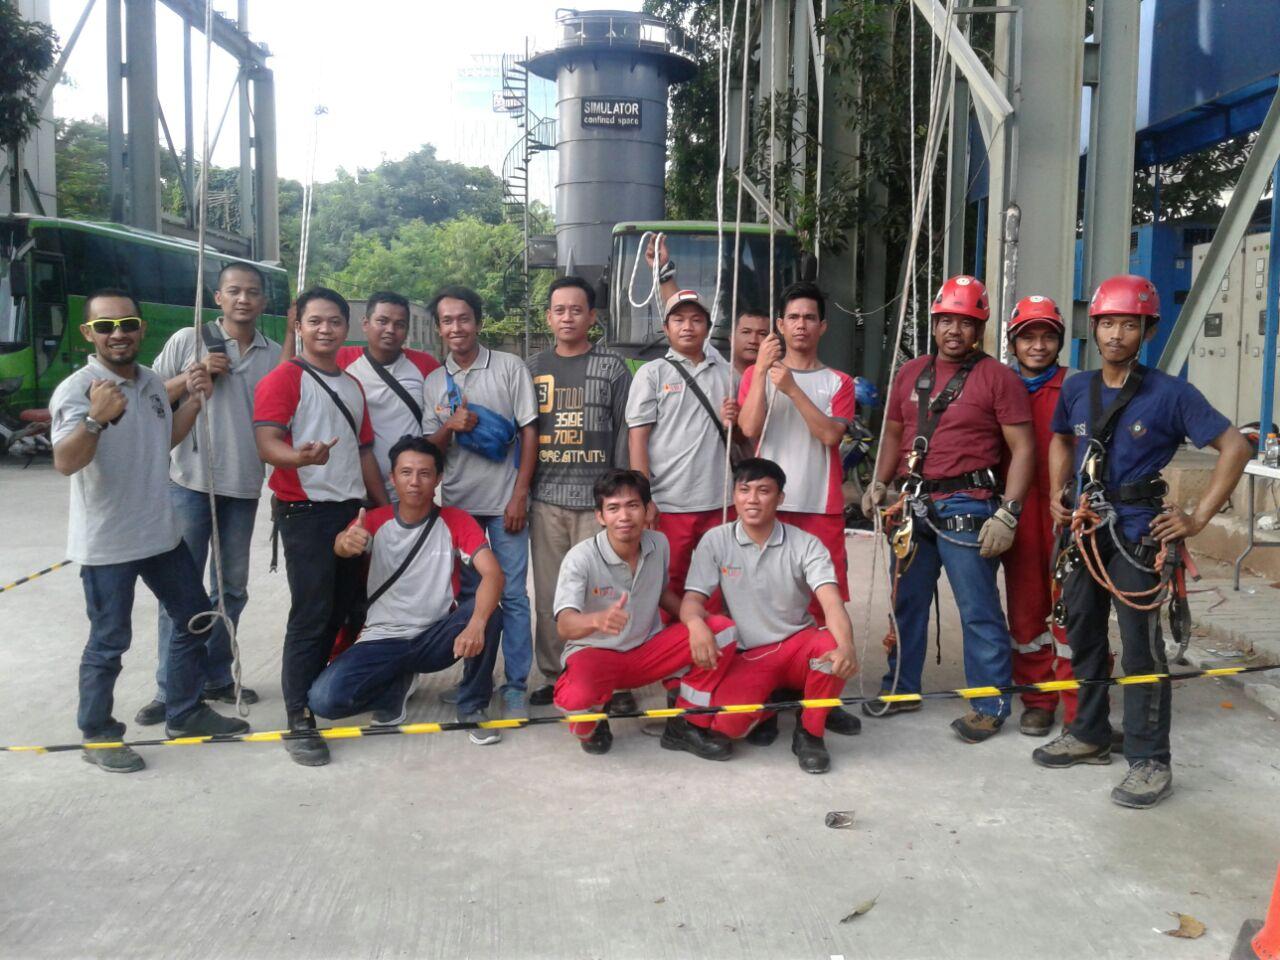 Pelatihan  K3 Tenaga Kerja Pada Ketinggian Tingkat 1 Publik, 11 s.d 13 April 2018